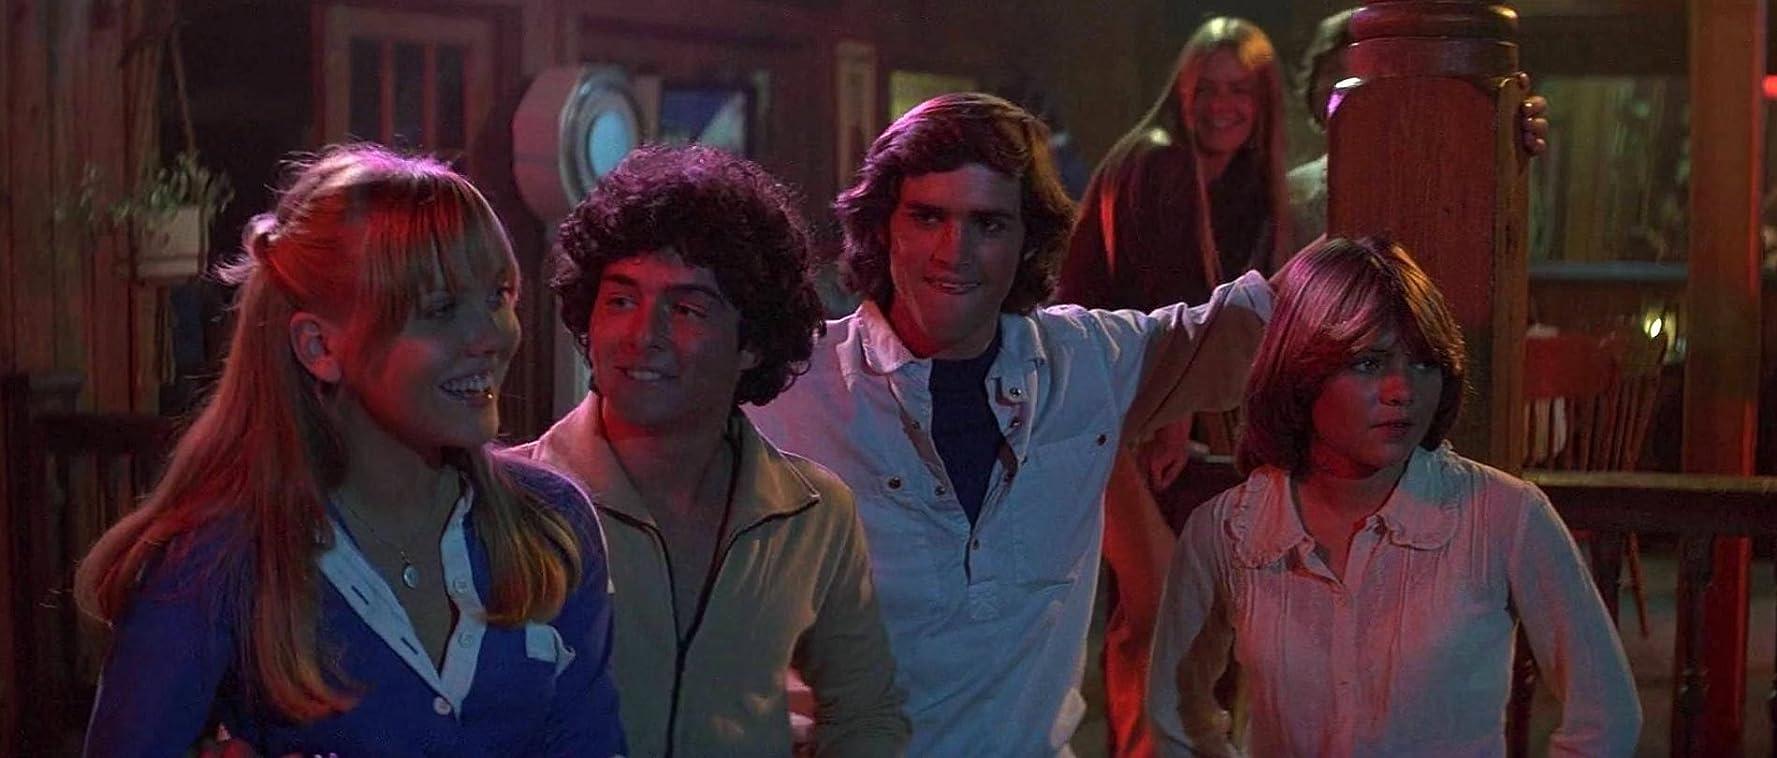 Fălci 2 - Jaws 2 (1978) Online Subtitrat in Romana